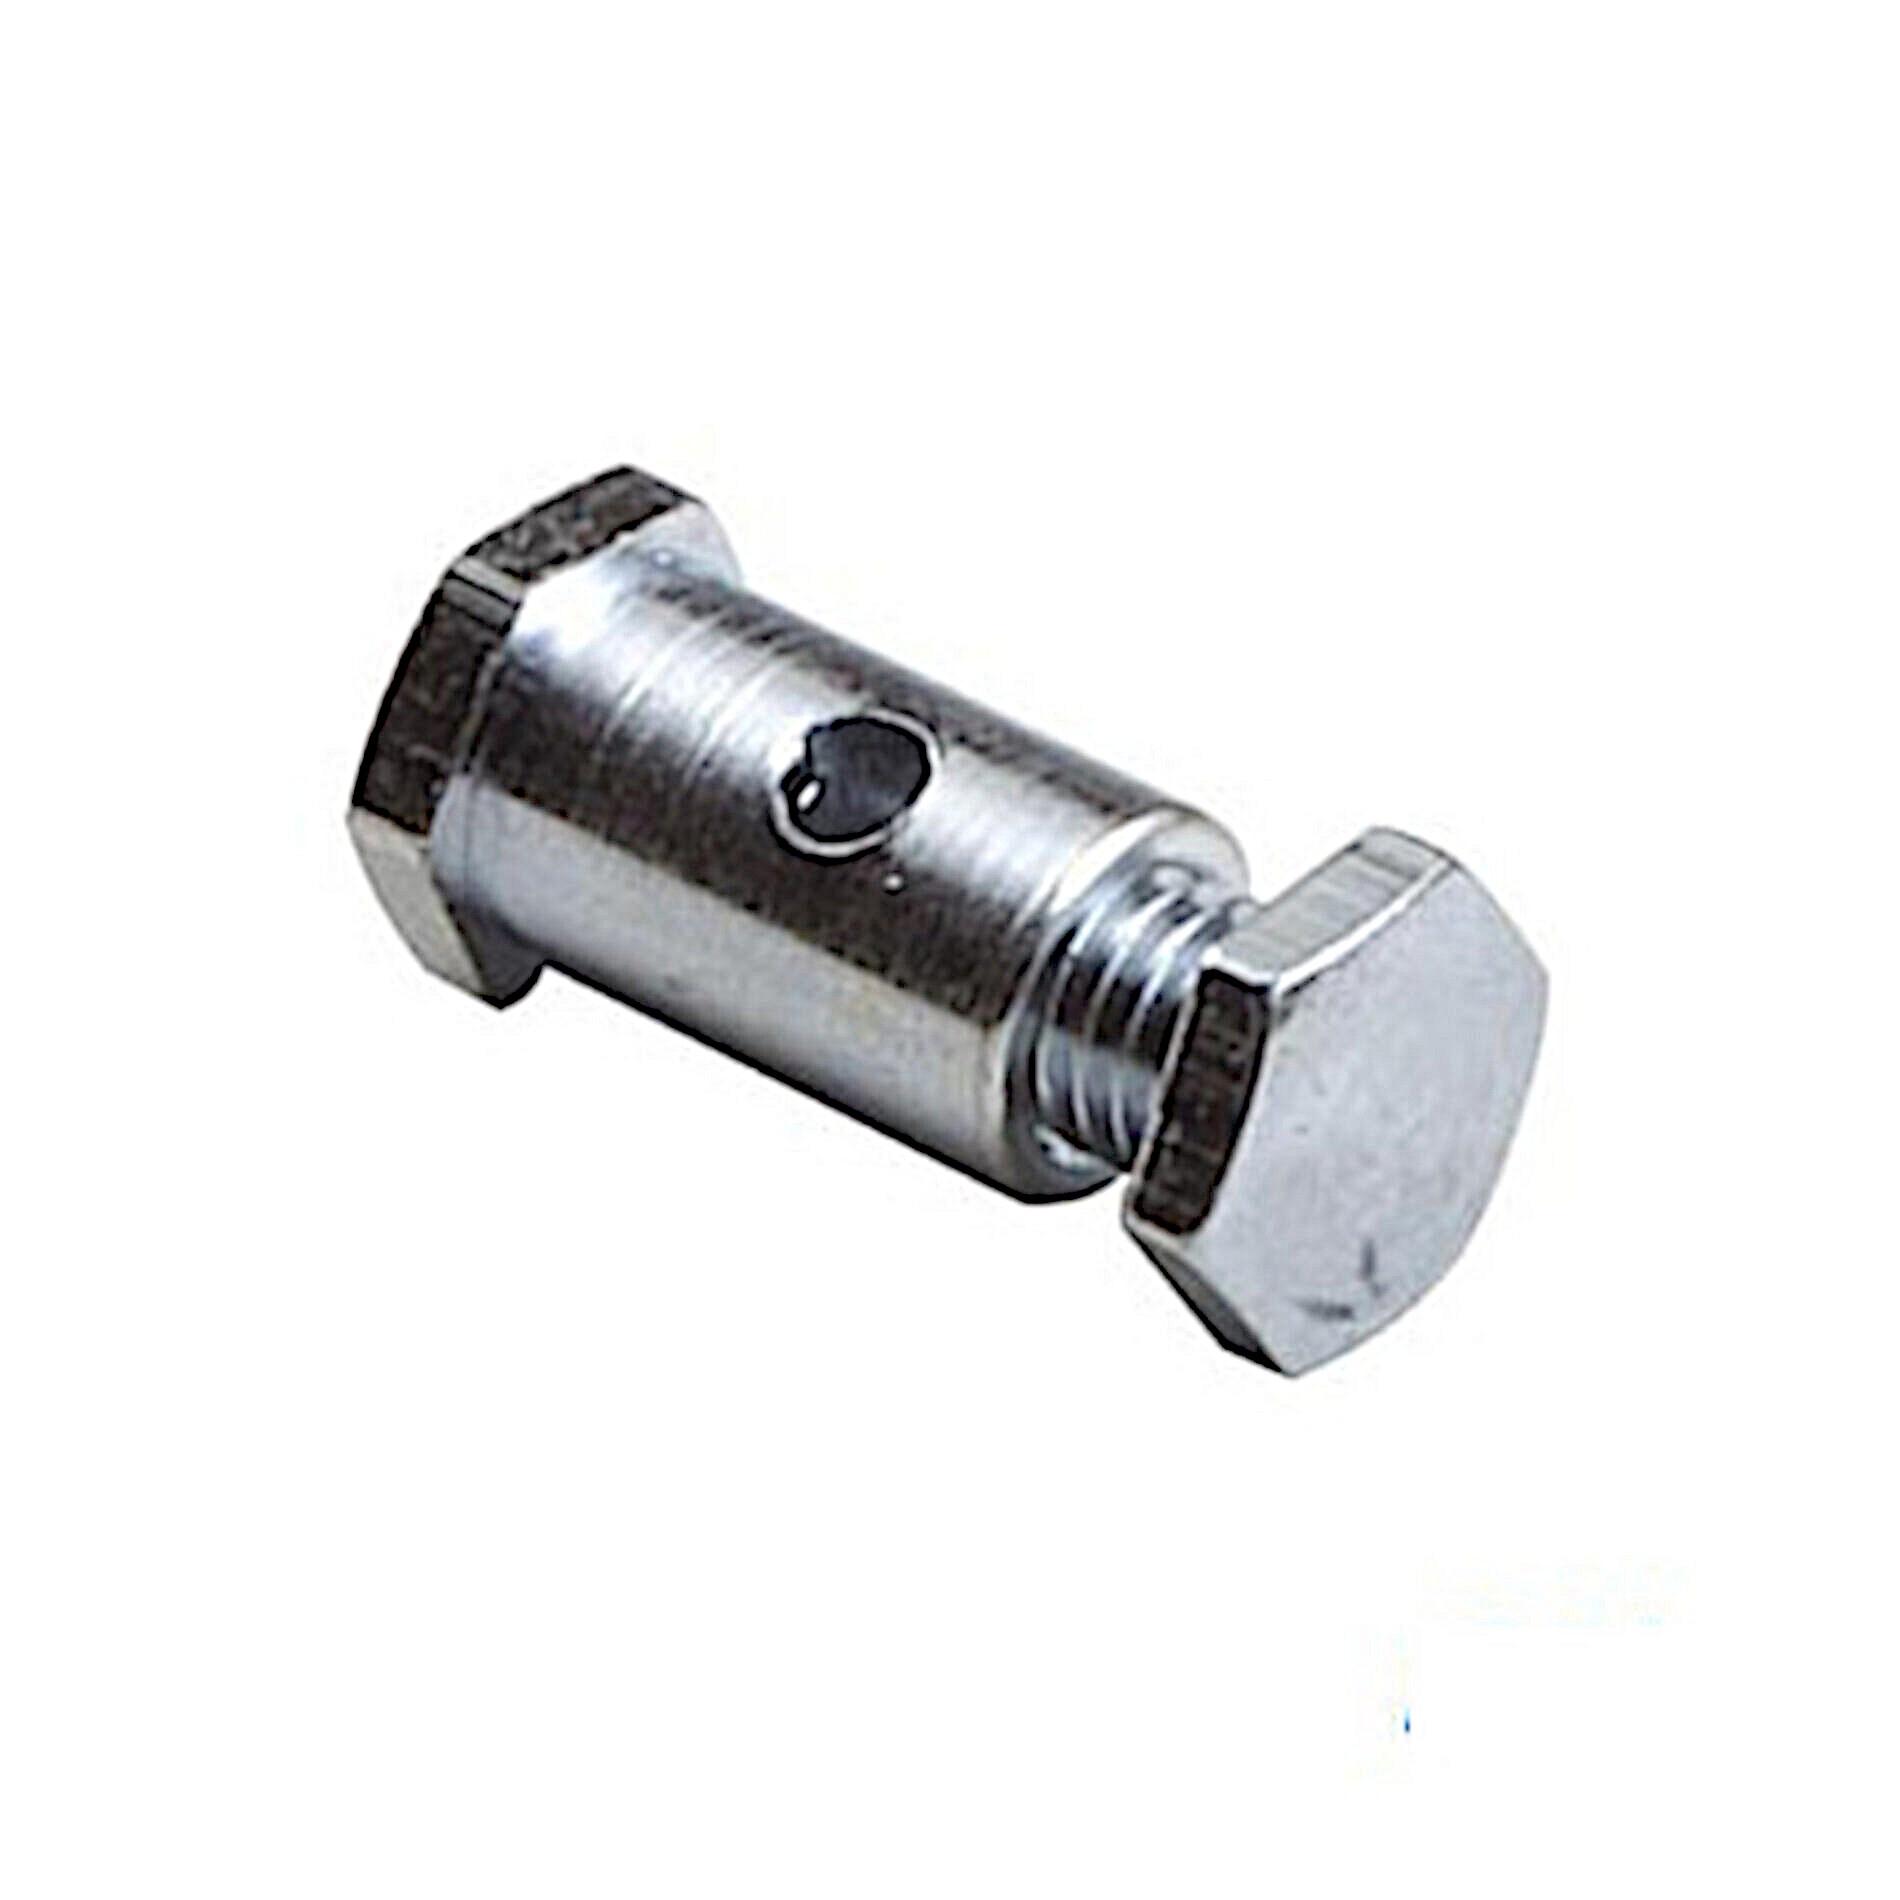 Serre câble frein Peugeot / MBK